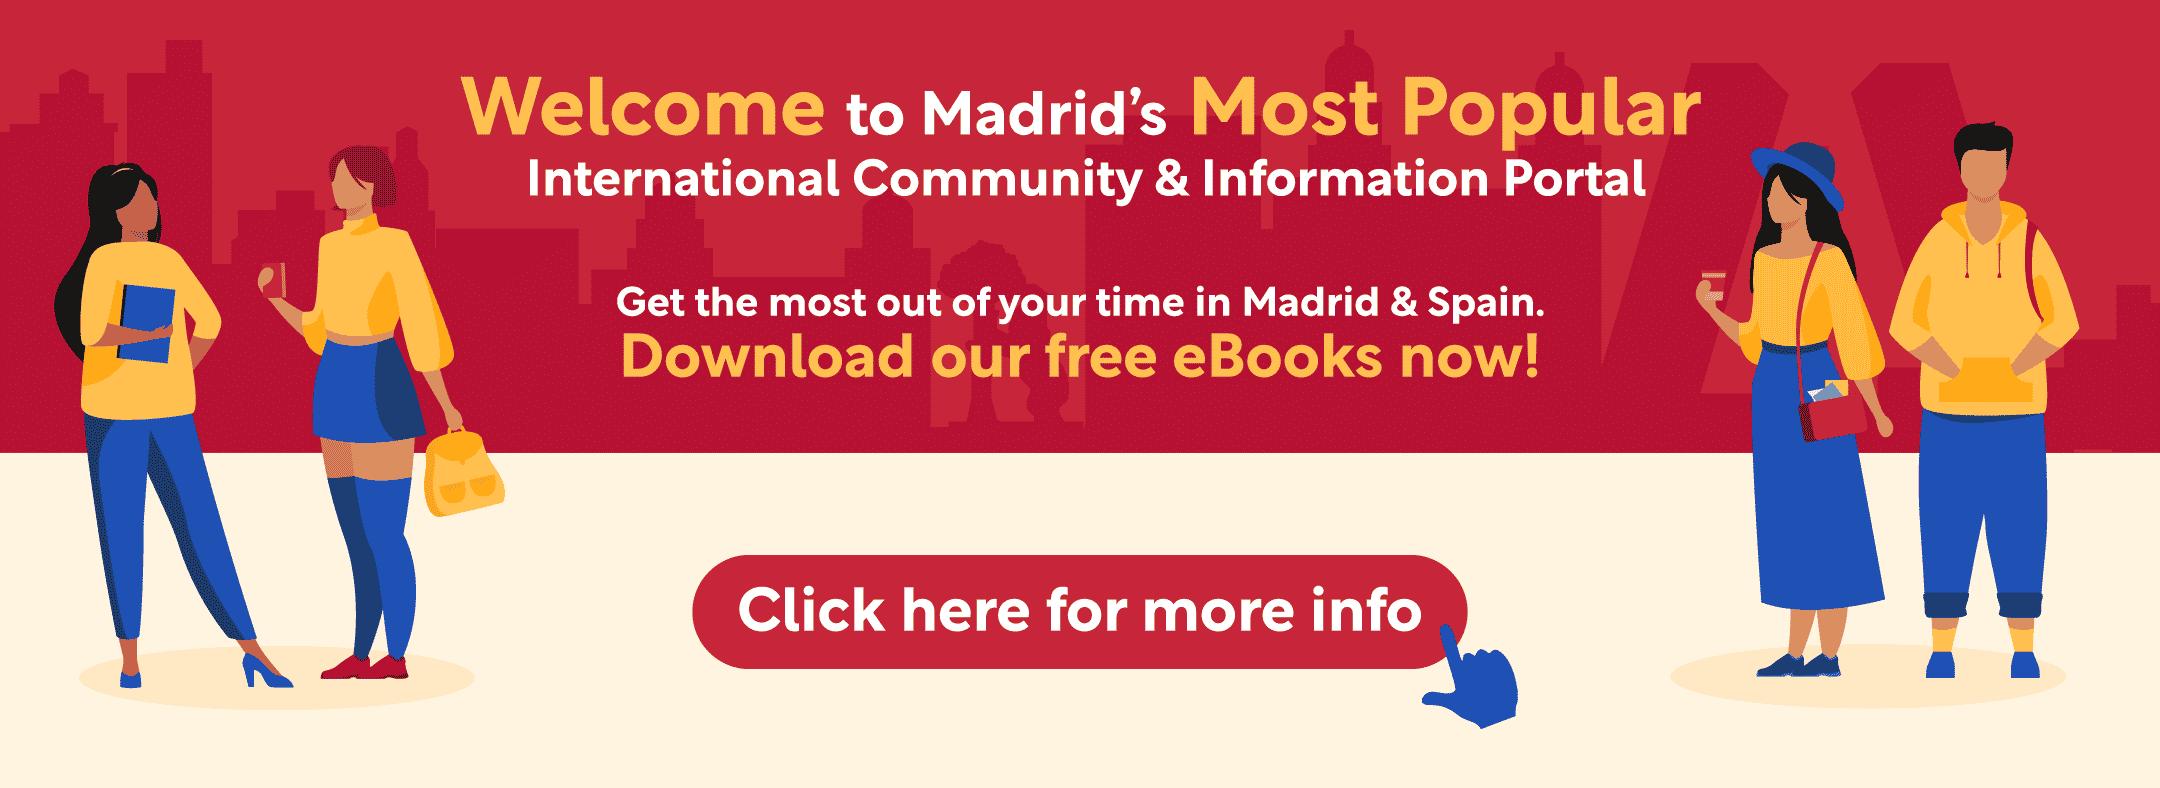 citylife-madrid-international-community-home-banner